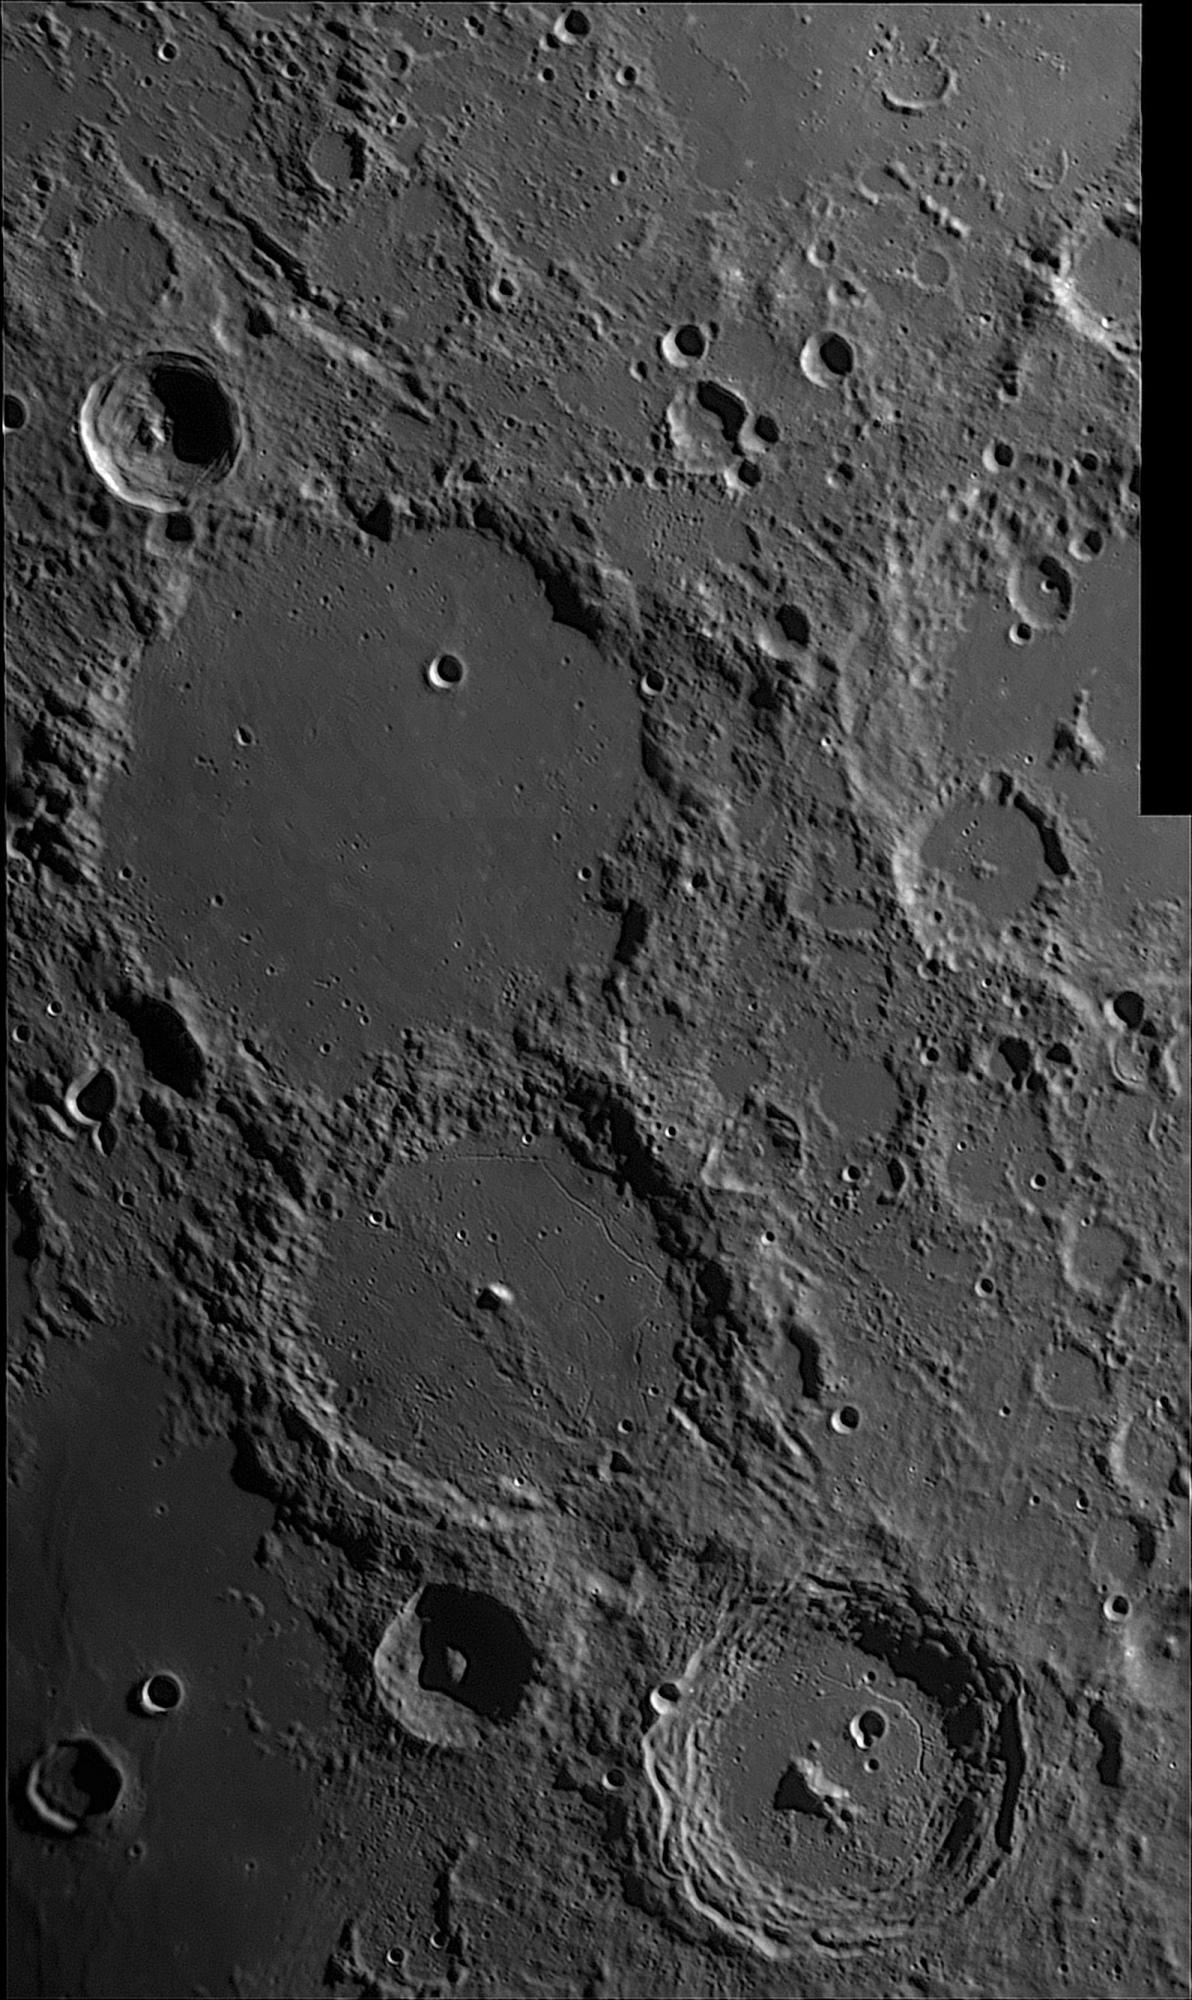 Moon_200530_205219_G_stitch.thumb.jpg.2477bd10171d69d8b59e83d8cb42d4bf.jpg